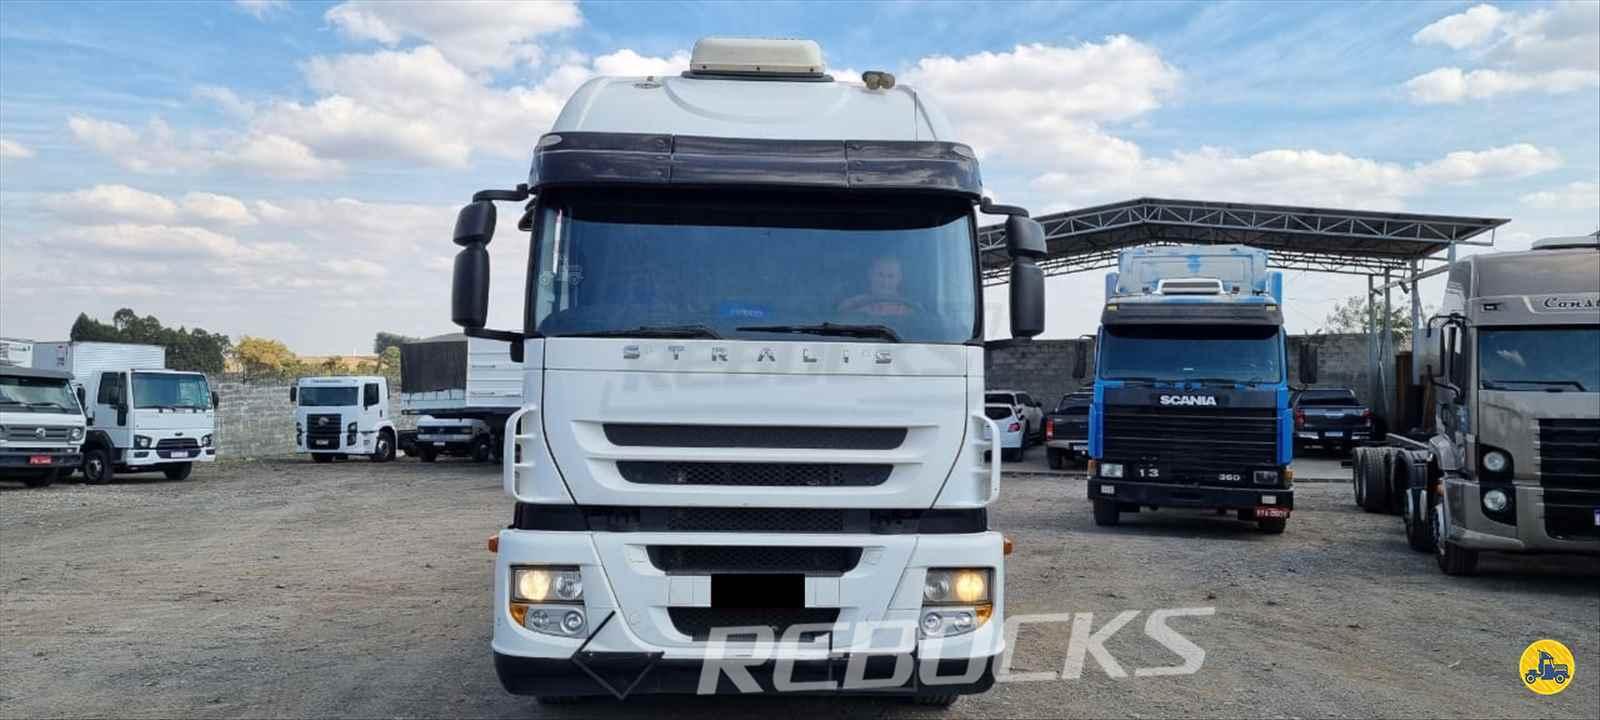 STRALIS 460 de Rebocks - LIMEIRA/SP